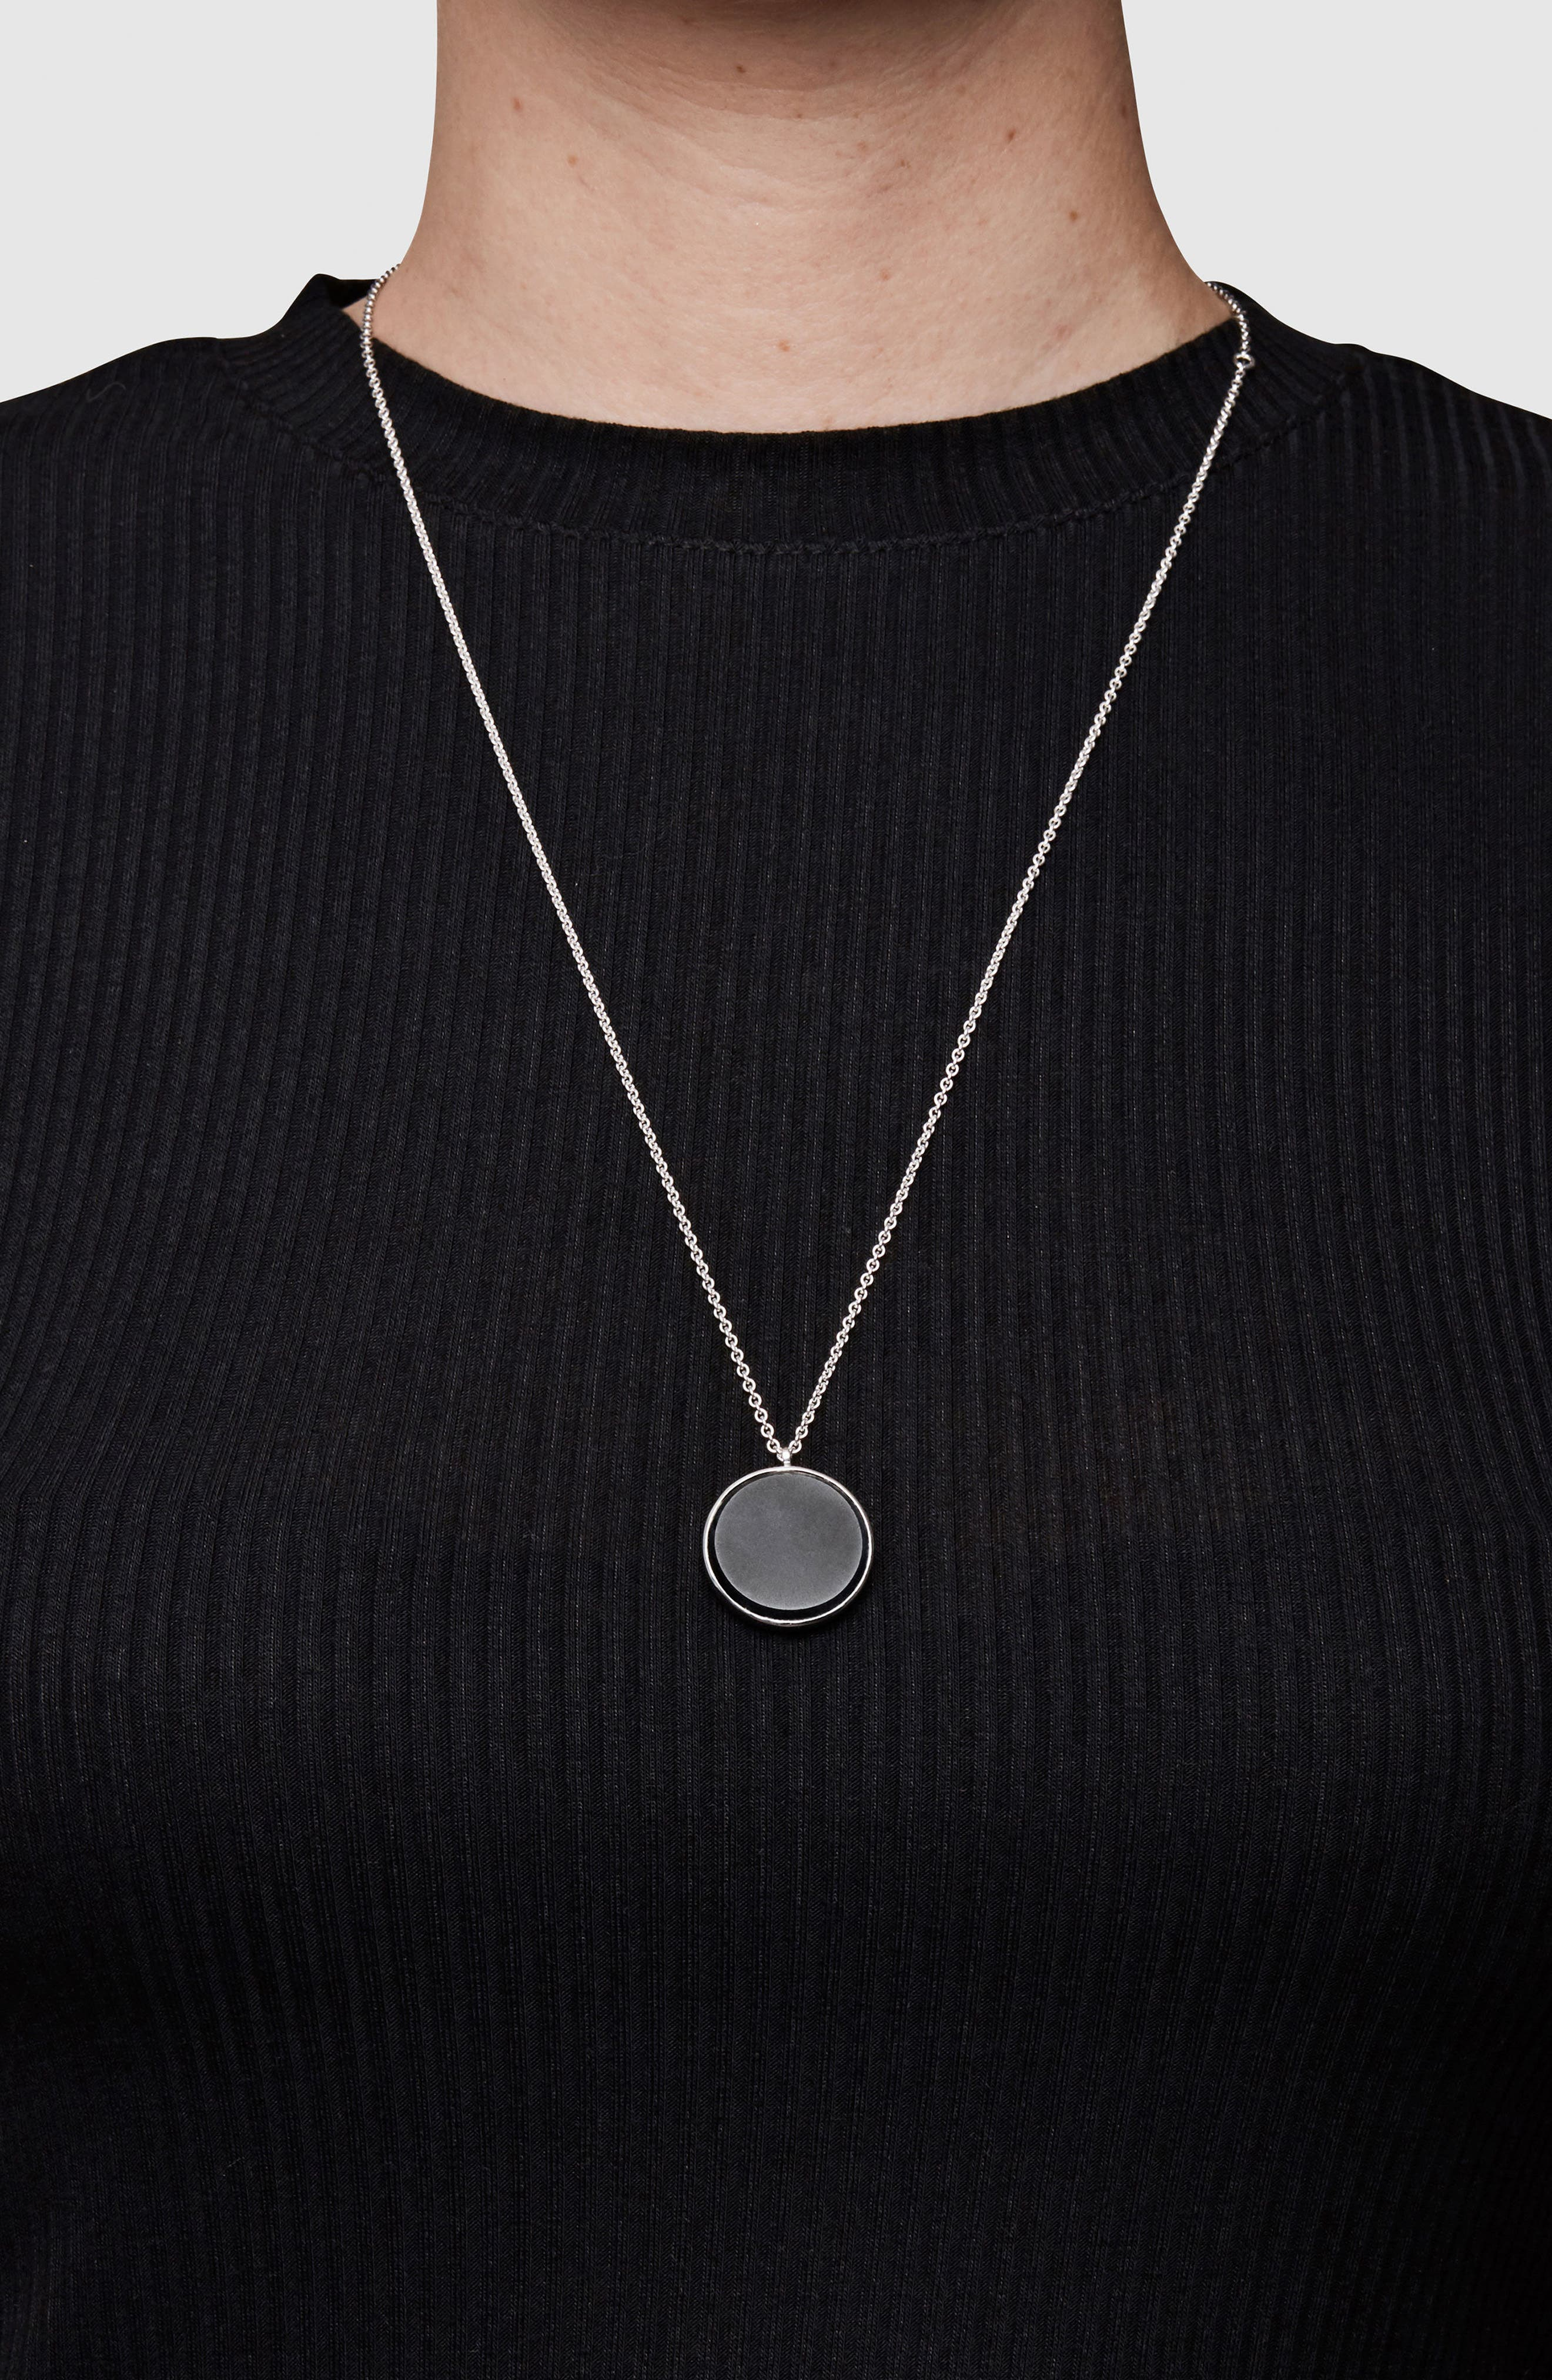 Black Onyx Medallion Necklace,                             Alternate thumbnail 4, color,                             SILVER